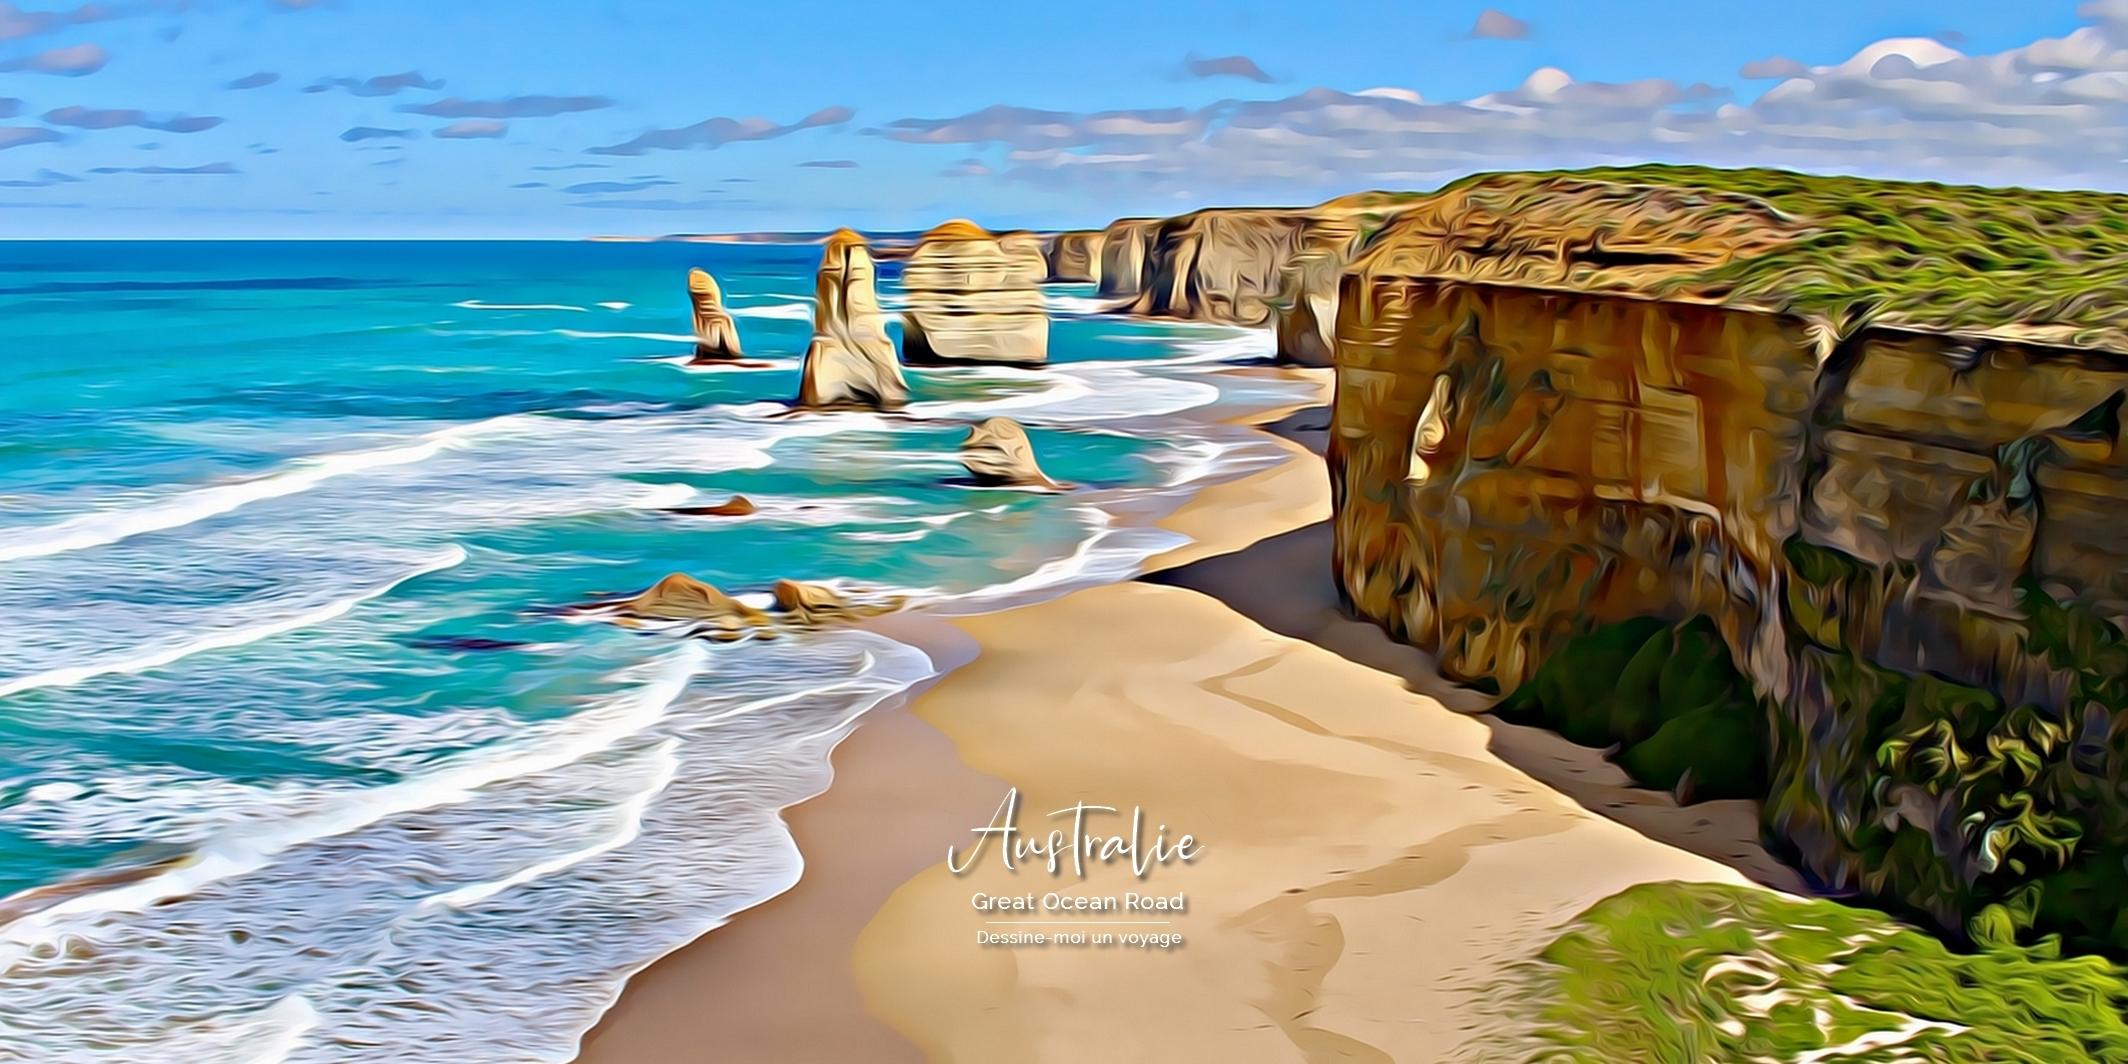 Tableau Panoramique Great Ocean Road 48x24